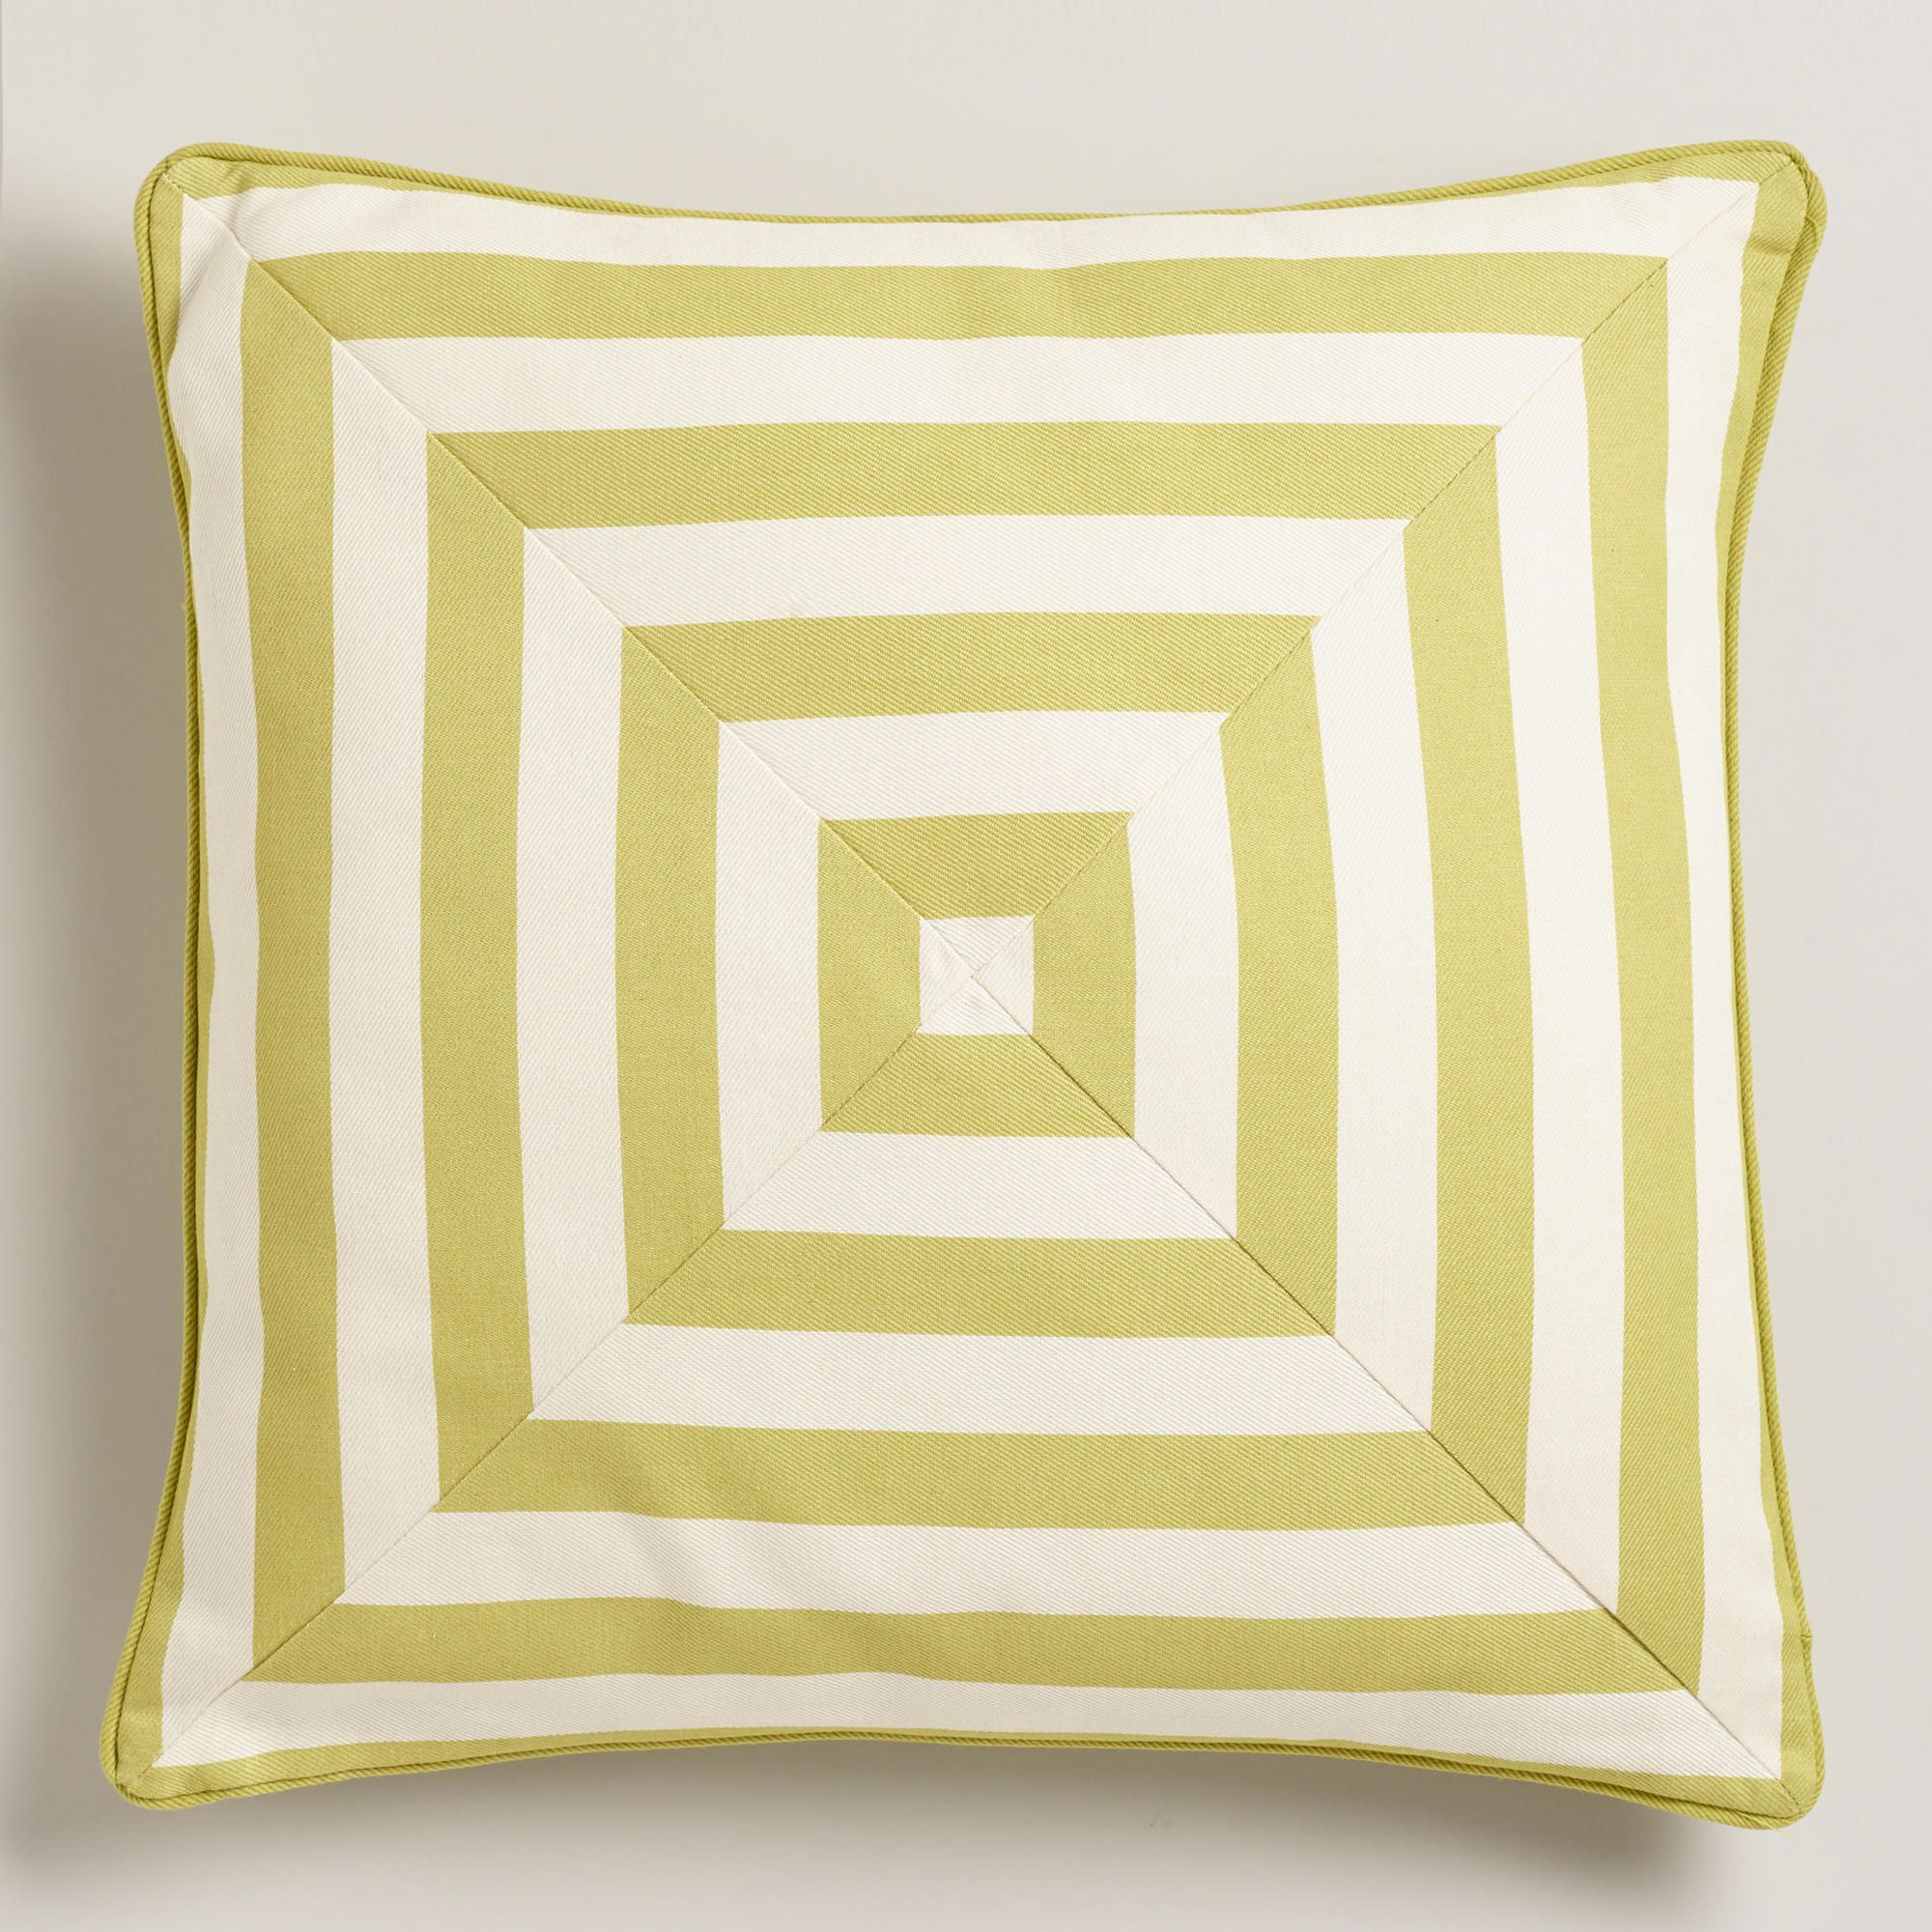 Oasis Green Stripe Throw Pillow | World Market $20 | For the ...